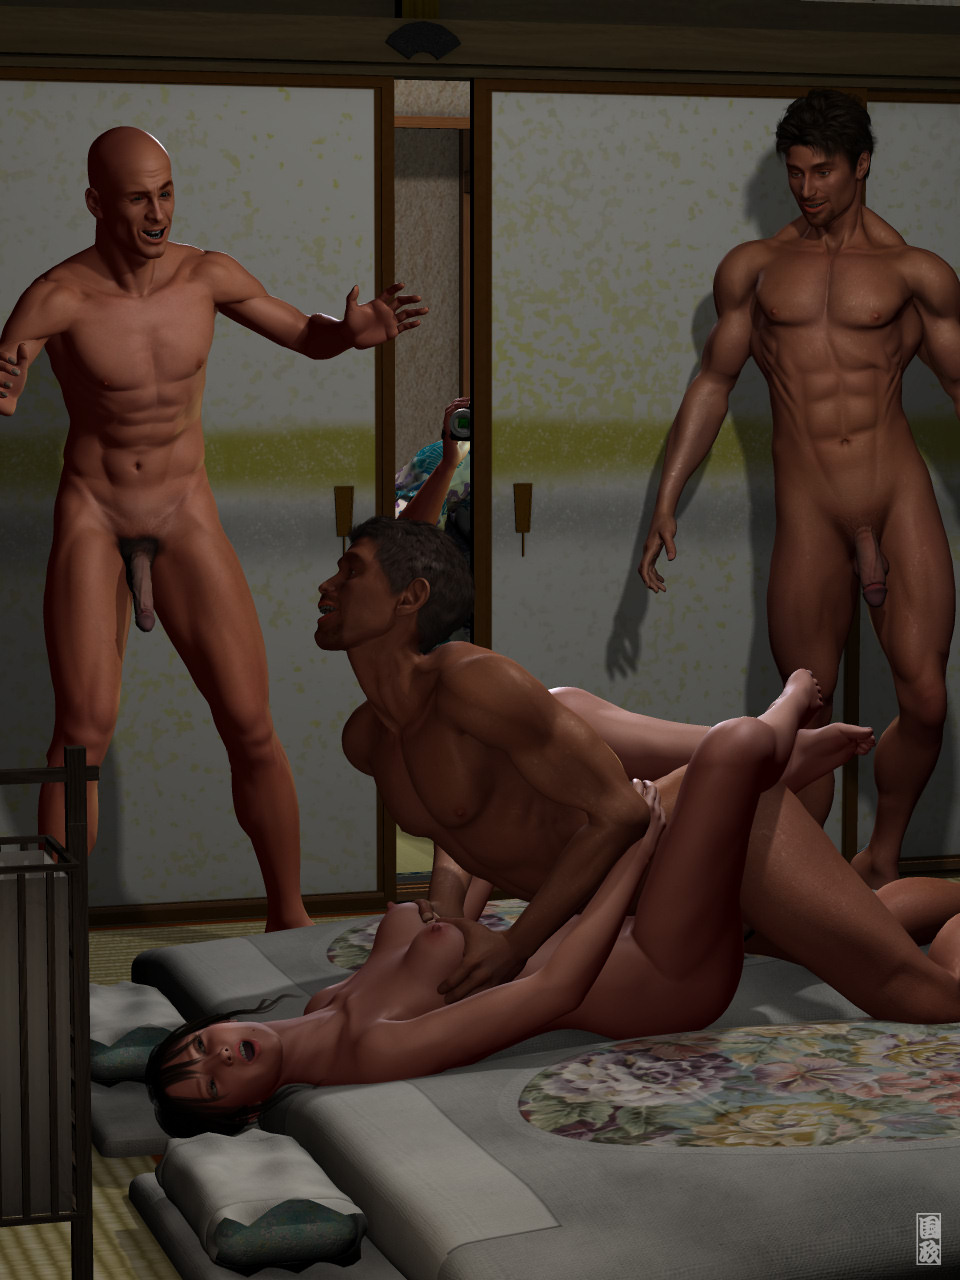 nude 3 d sex comics galleries